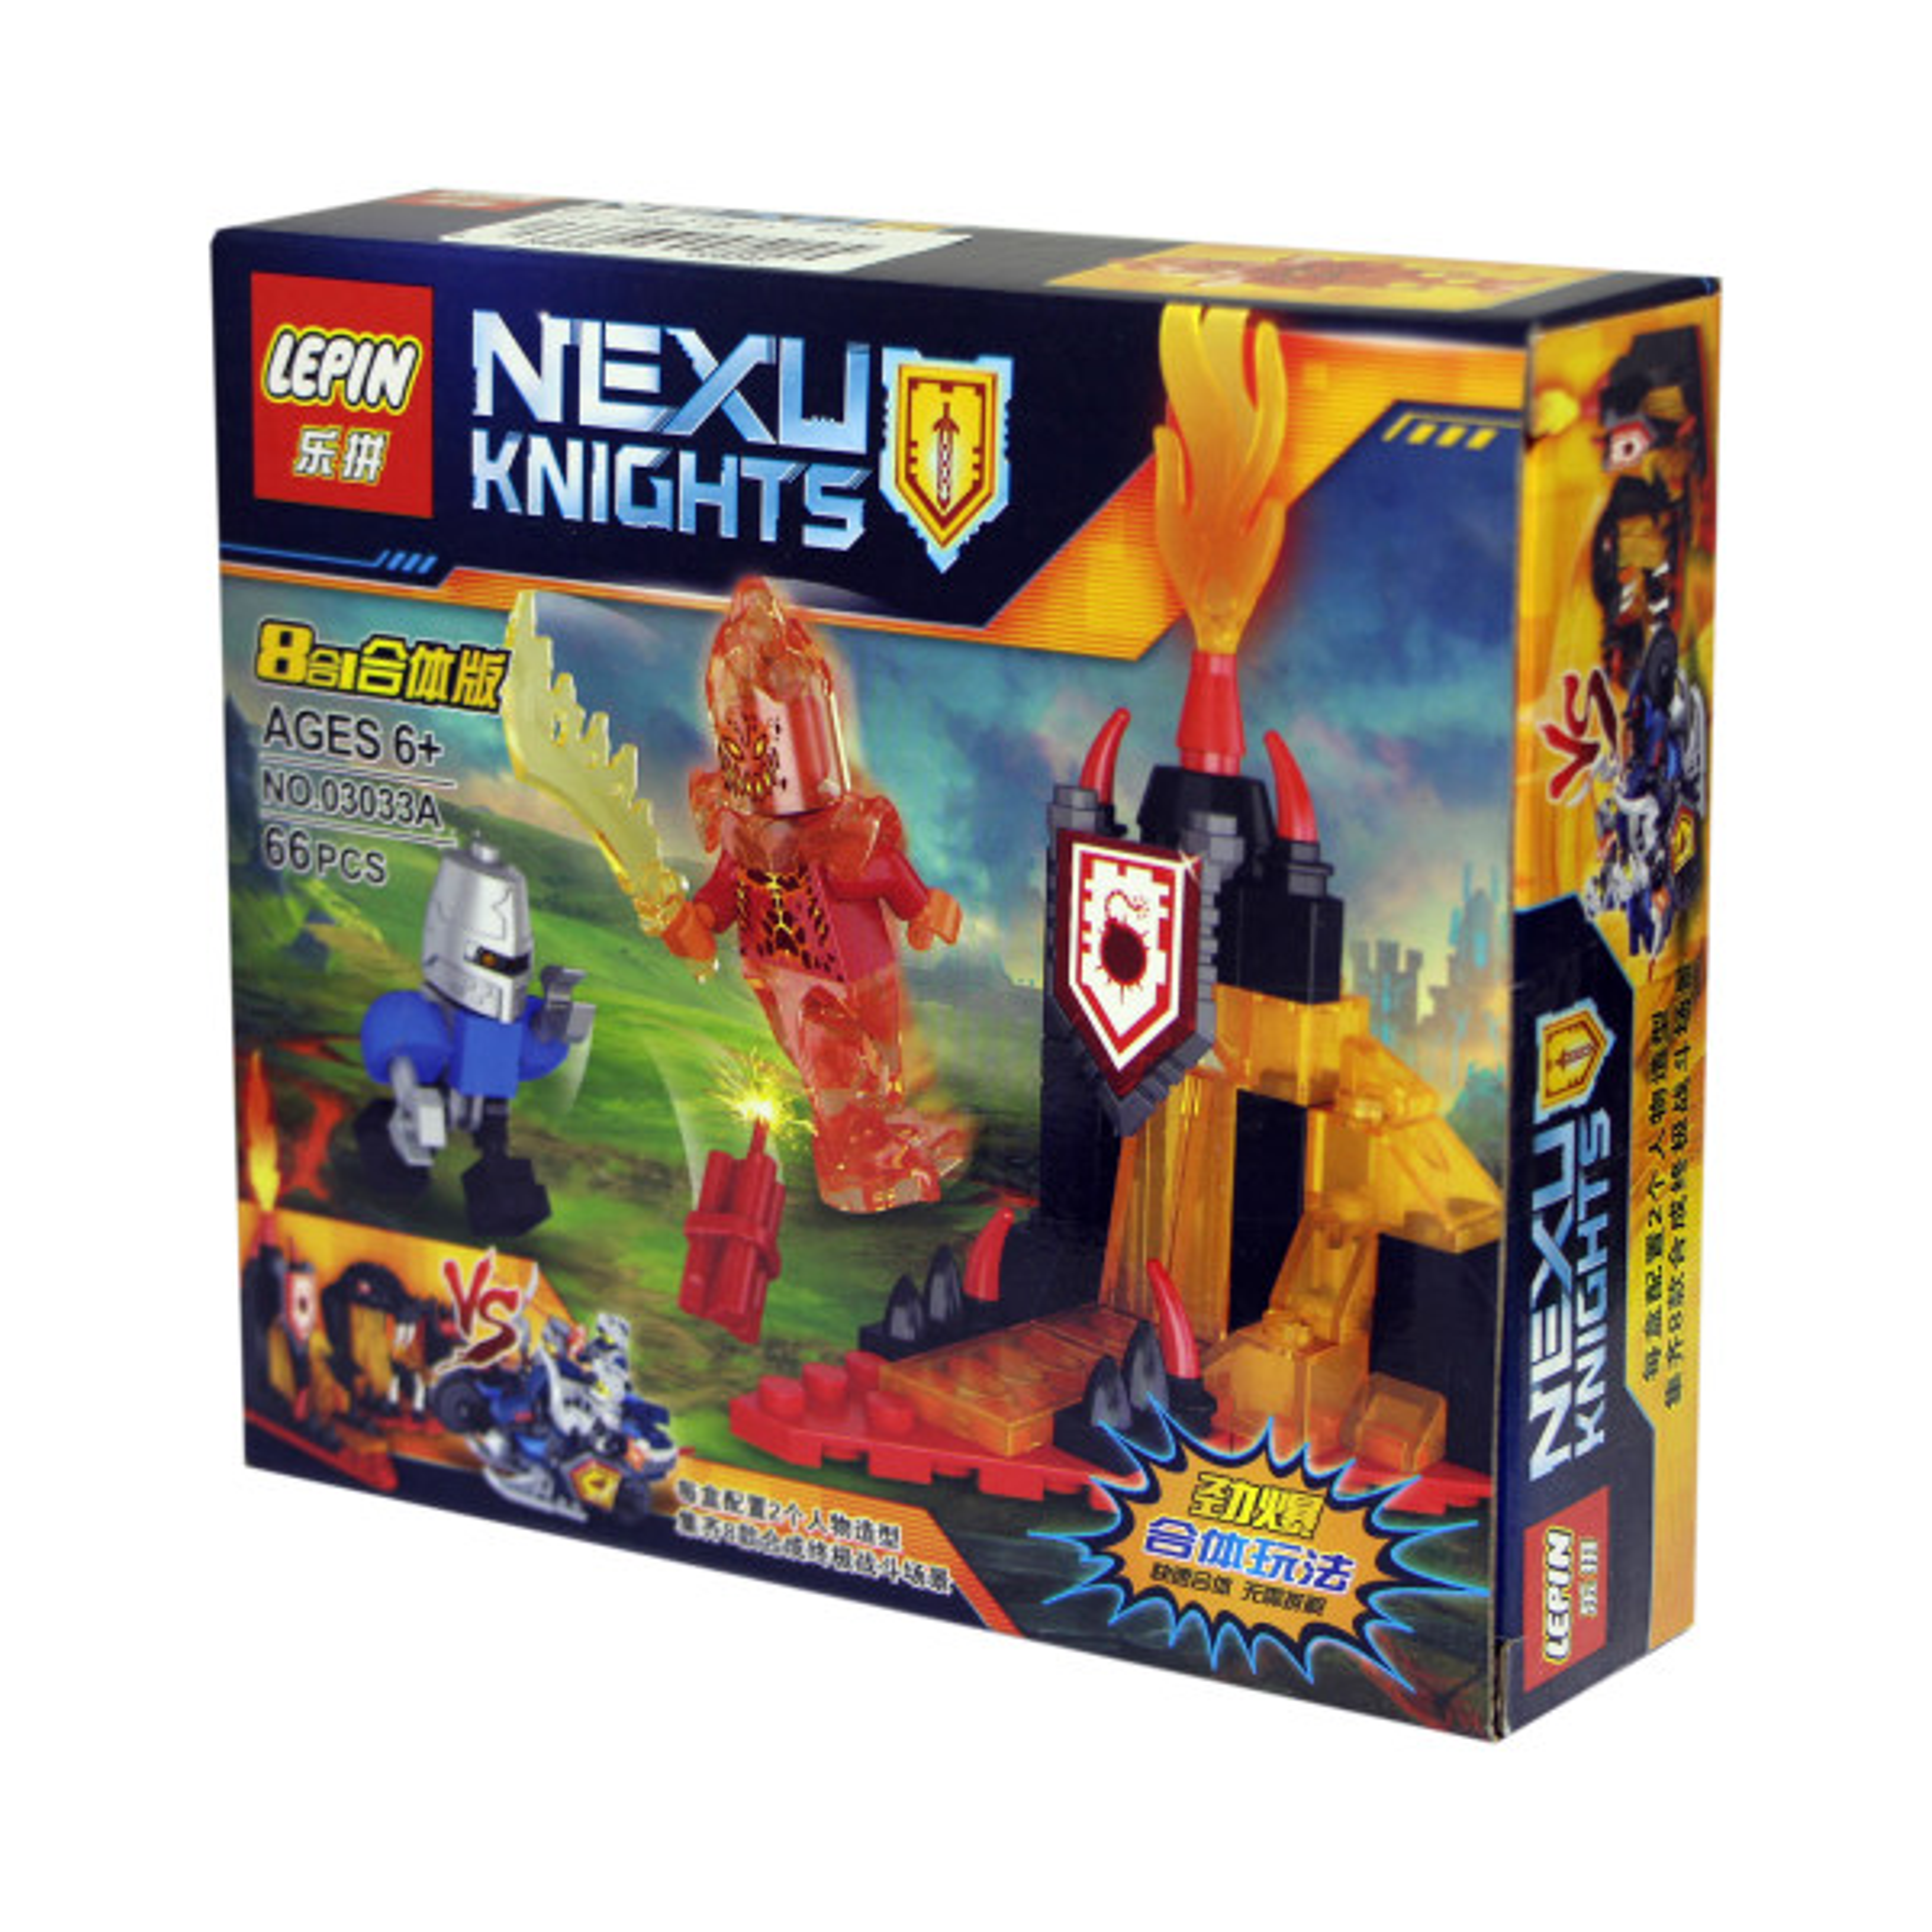 ساختنی لپین مدل Nexu Knights 03033A